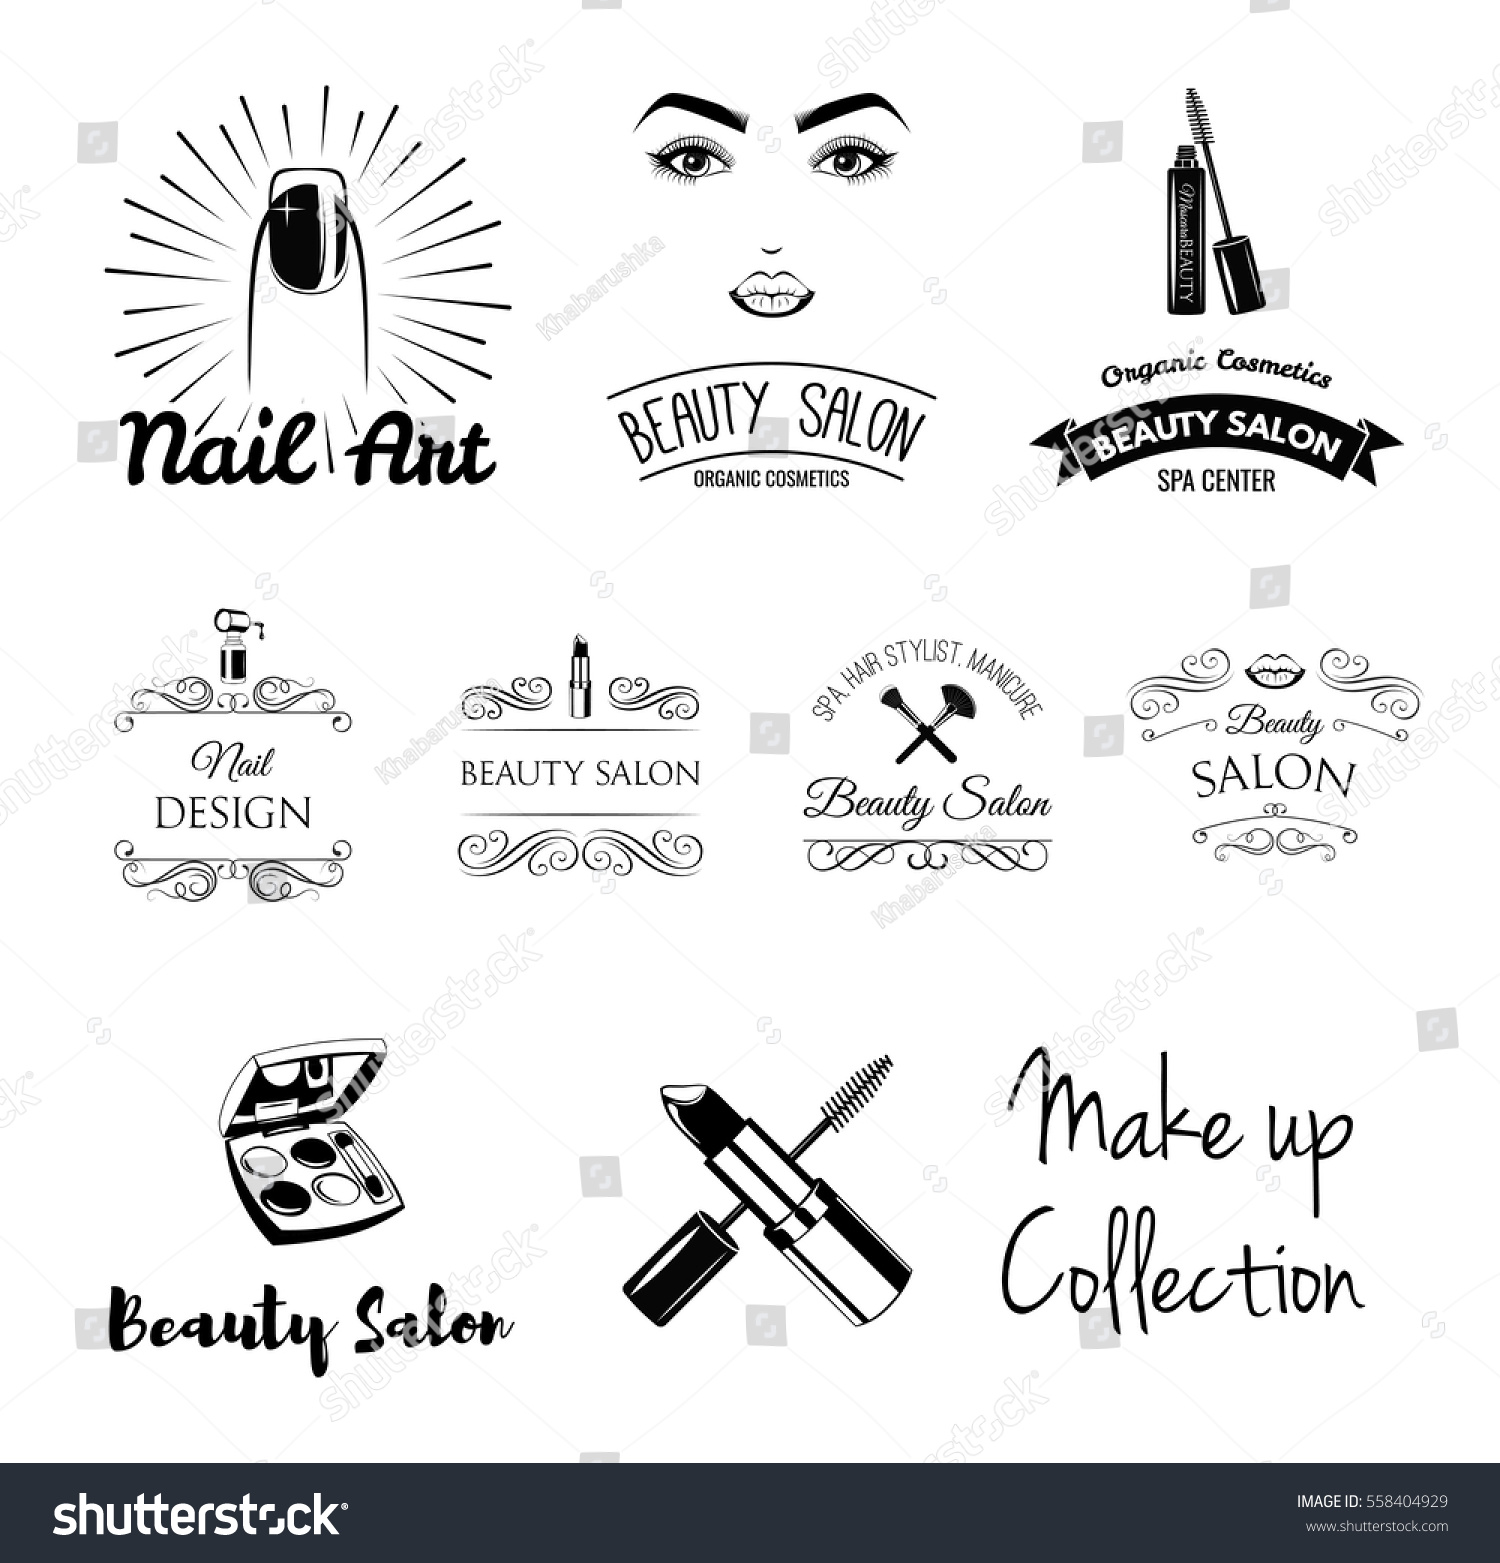 Beauty salon design elements vintage style stock vector for Salon blueprint maker